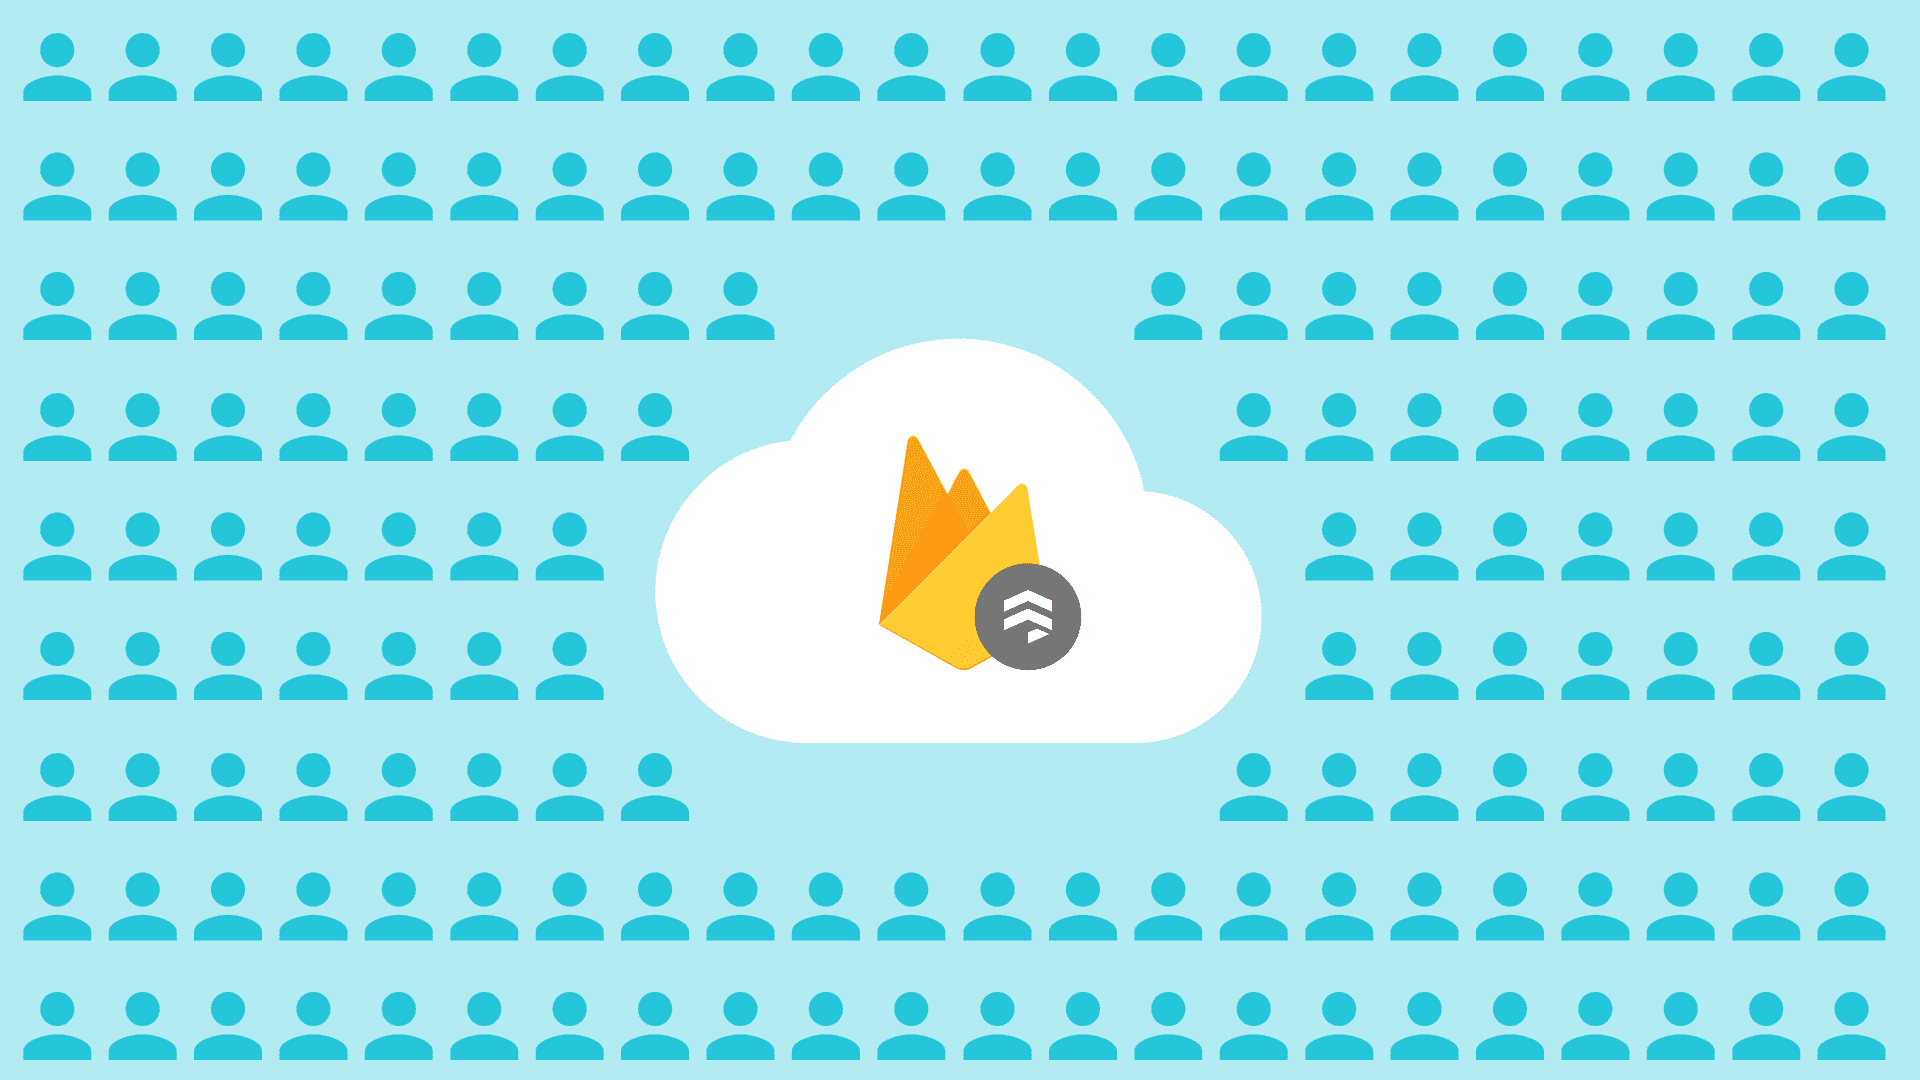 Firebase Firestore ロゴとユーザーのイラスト